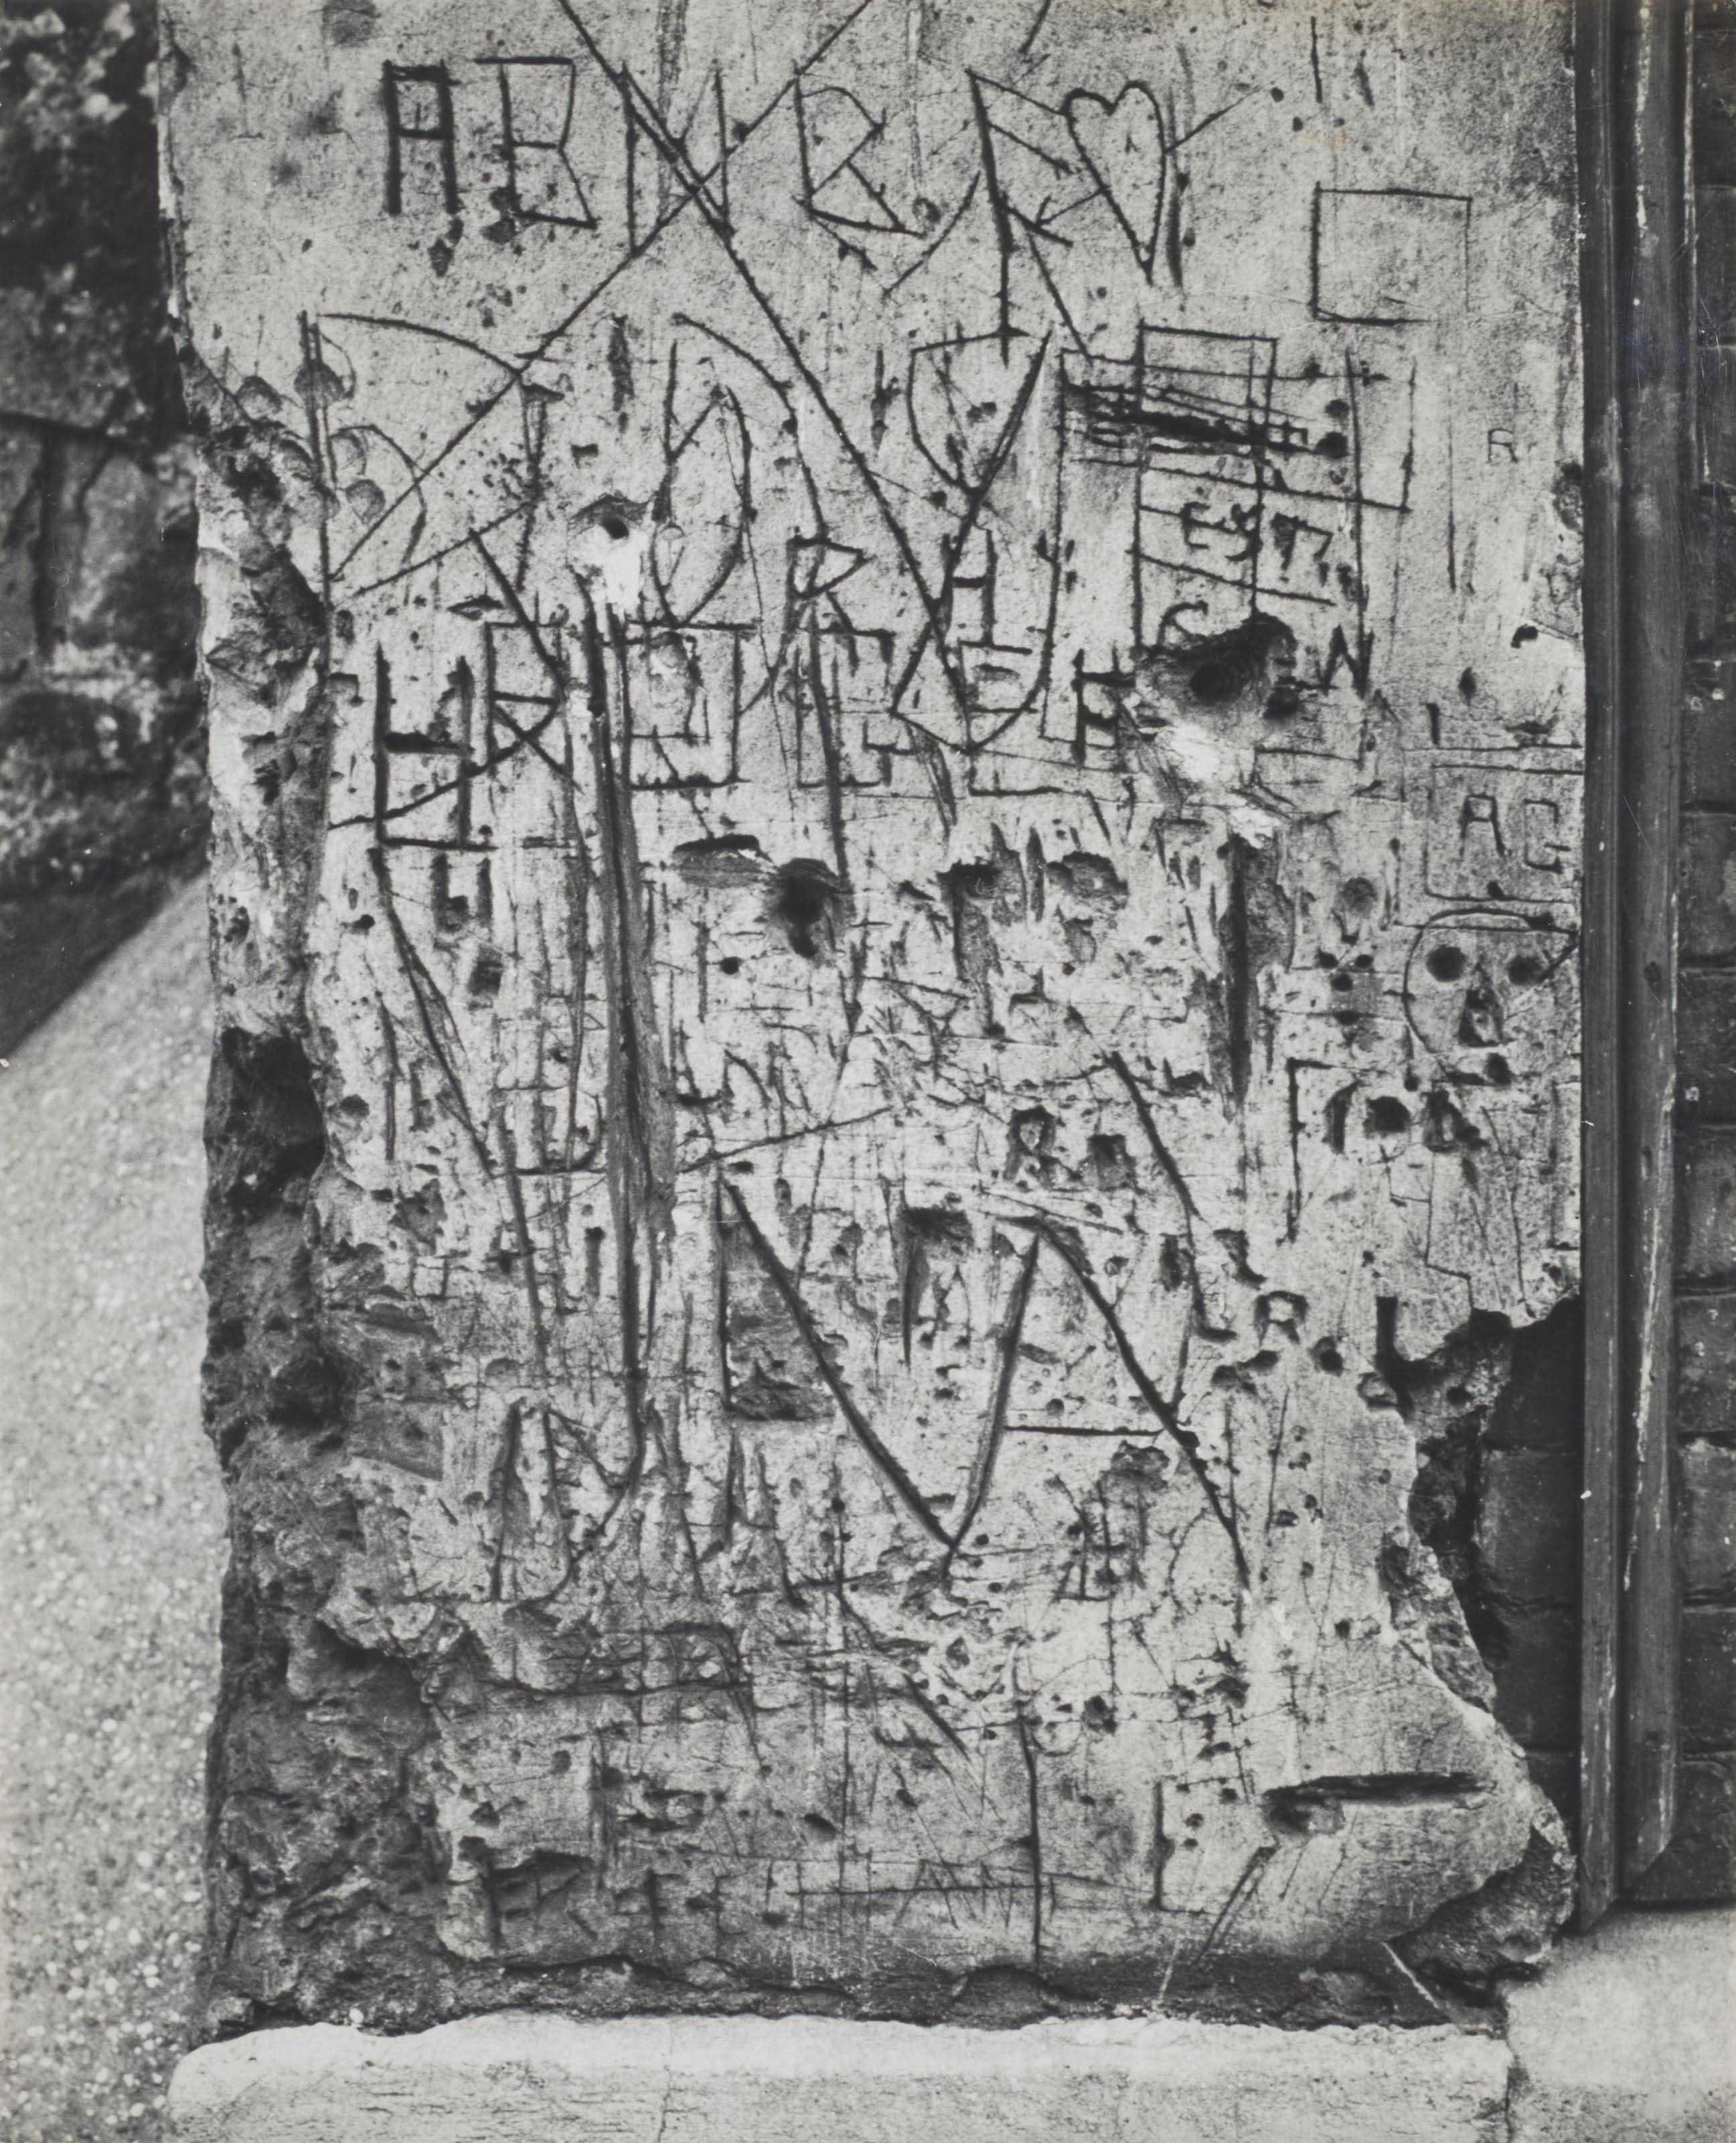 Graffiti, série II 'Langage du mur', vers 1933-1950